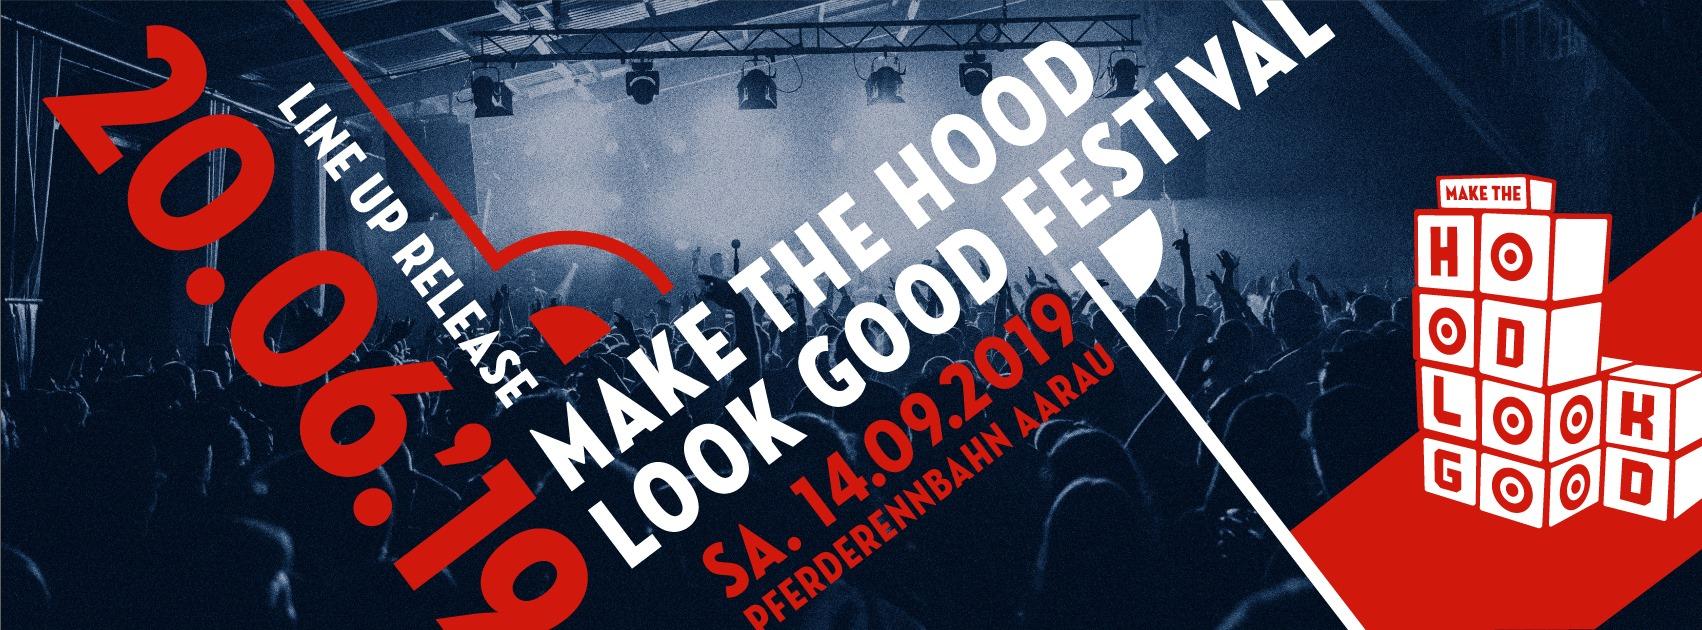 Make The Hood Look Good